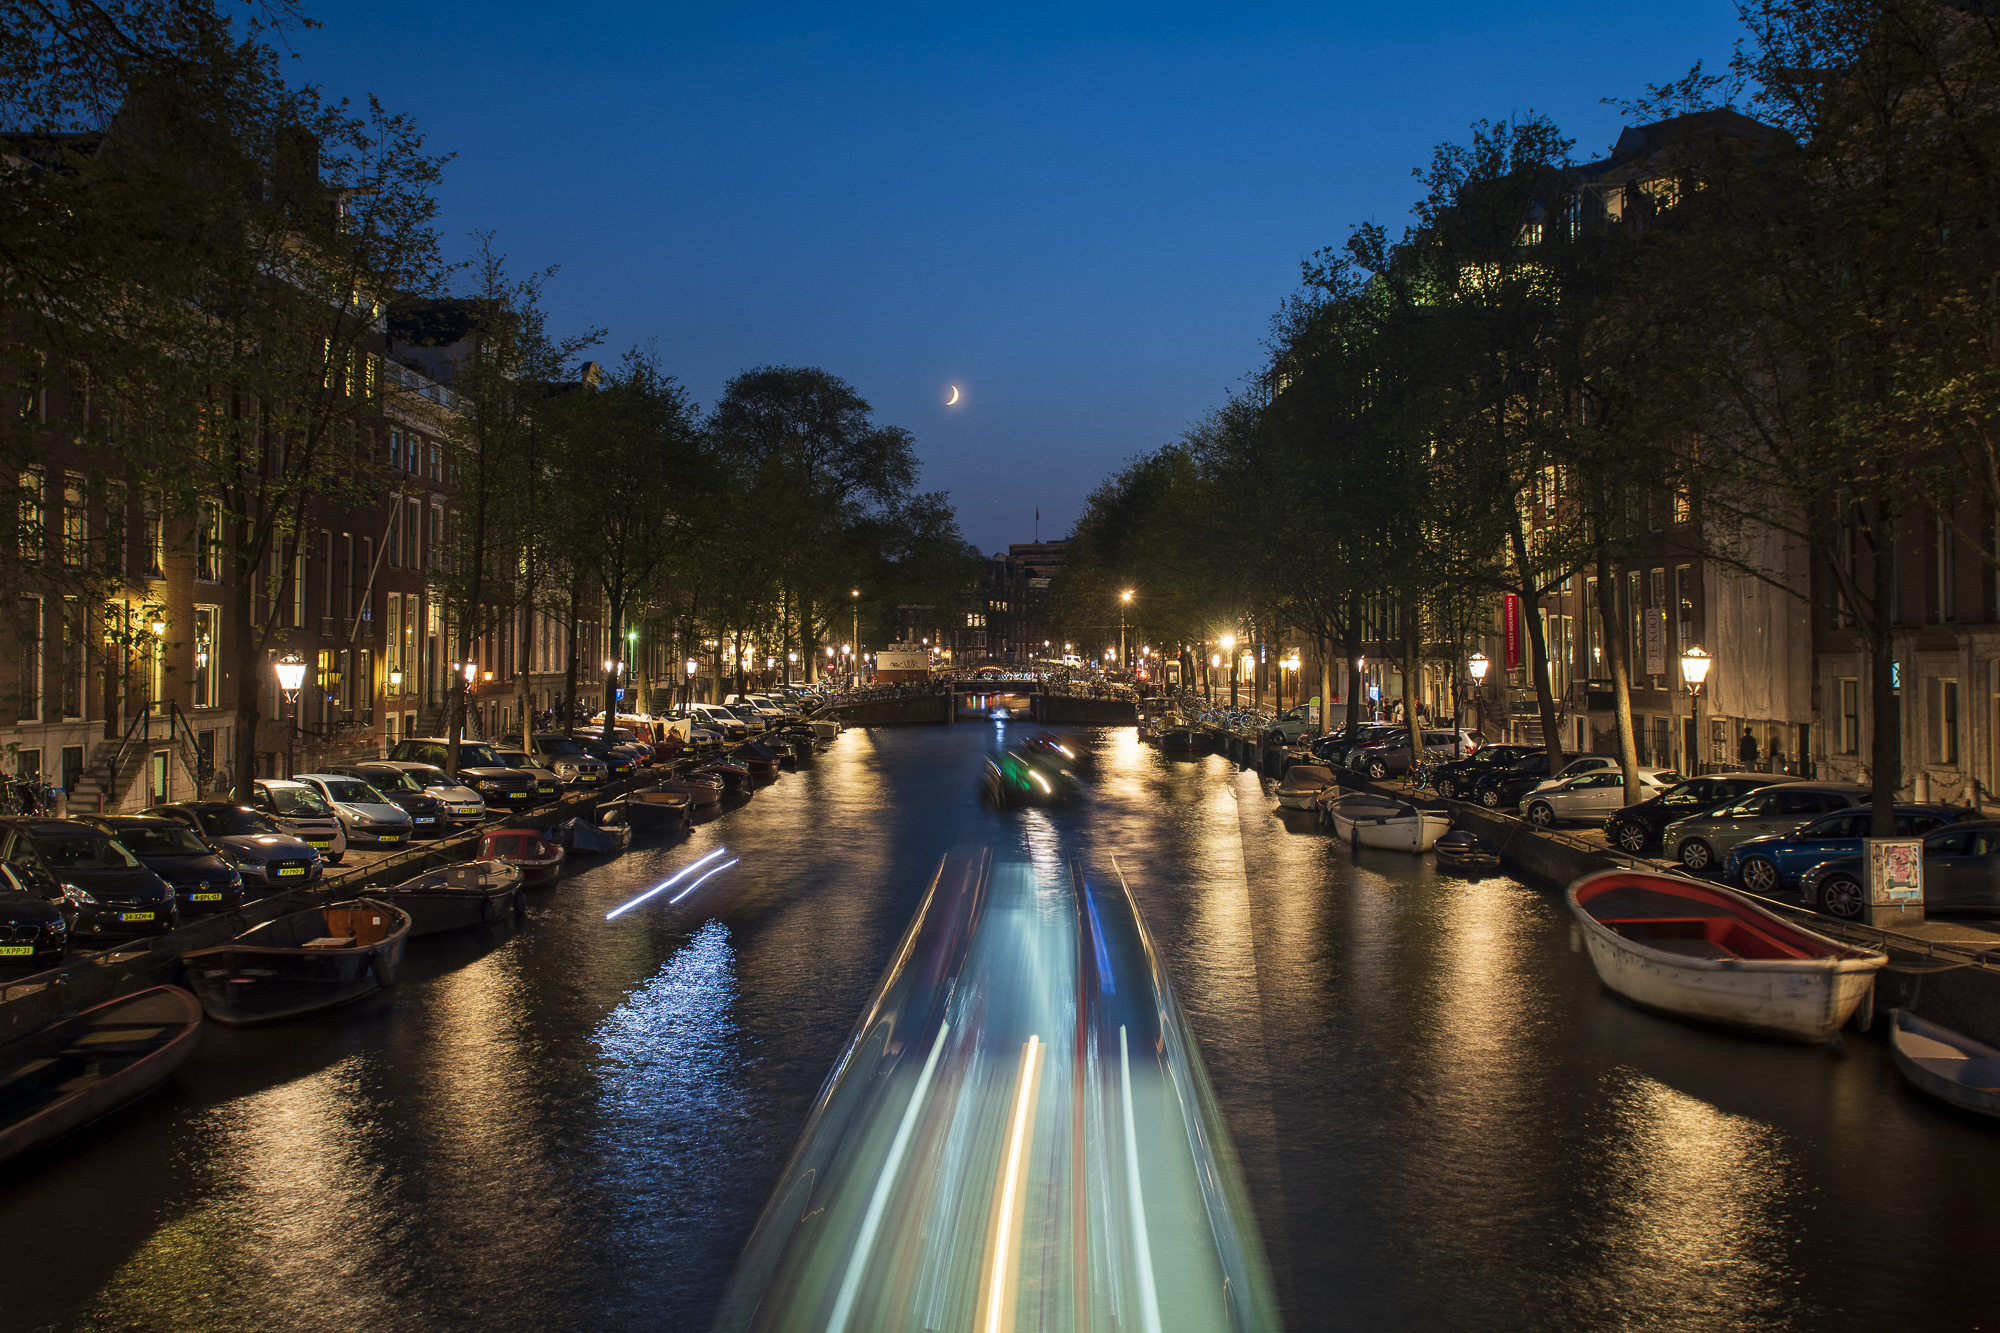 amsterdam-photo-tour-011.jpg